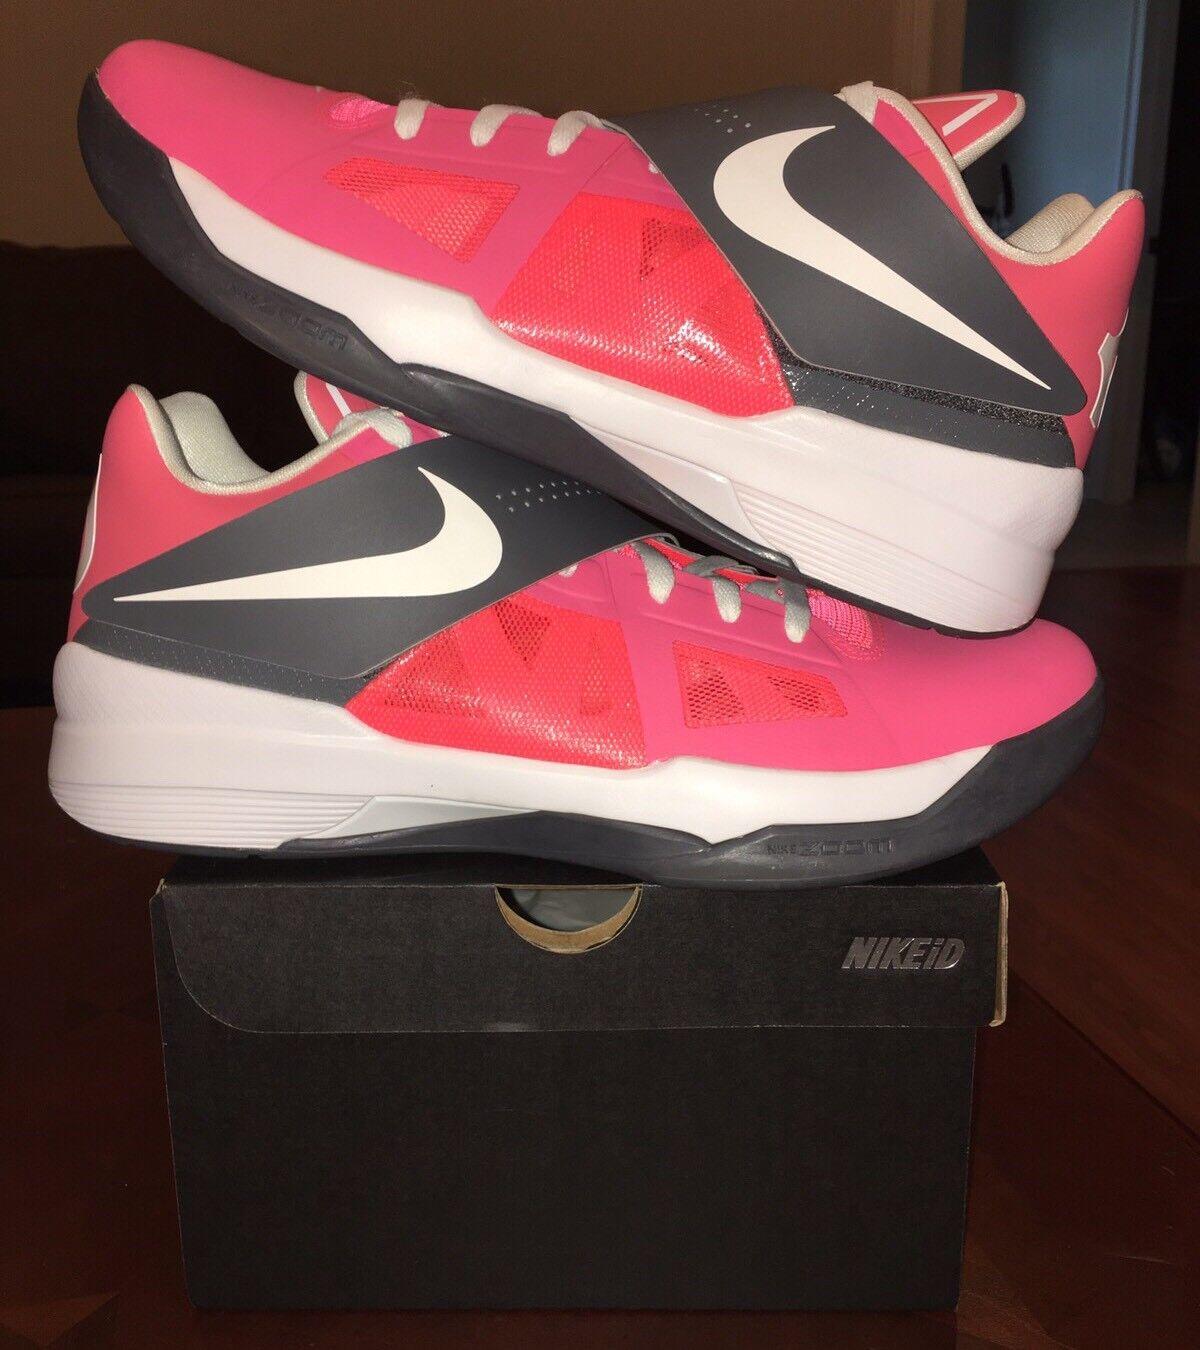 Nike KD 4 id IV id 4 Rosa Gris Jordan Retro 13 ovo Yeezy 1 2 3 4 5 6 7 8 9 10 11 12 casual muy salvaje 214a94